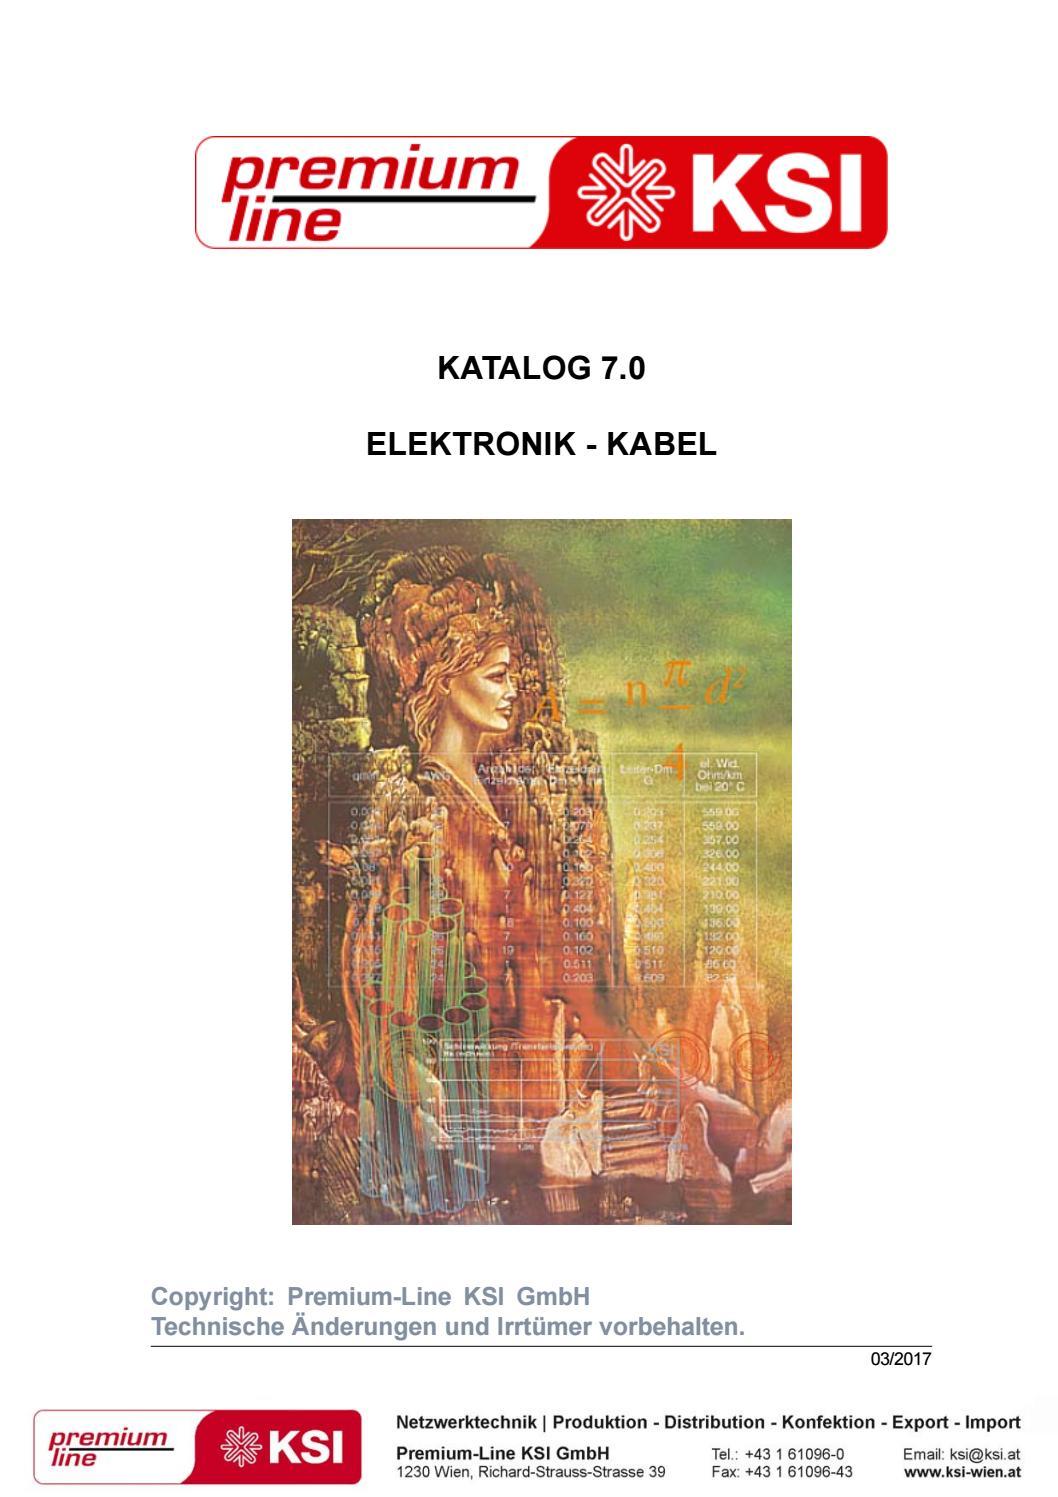 Elektronik - Kabel by Premium-Line KSI GmbH, Gerald Tranker - issuu